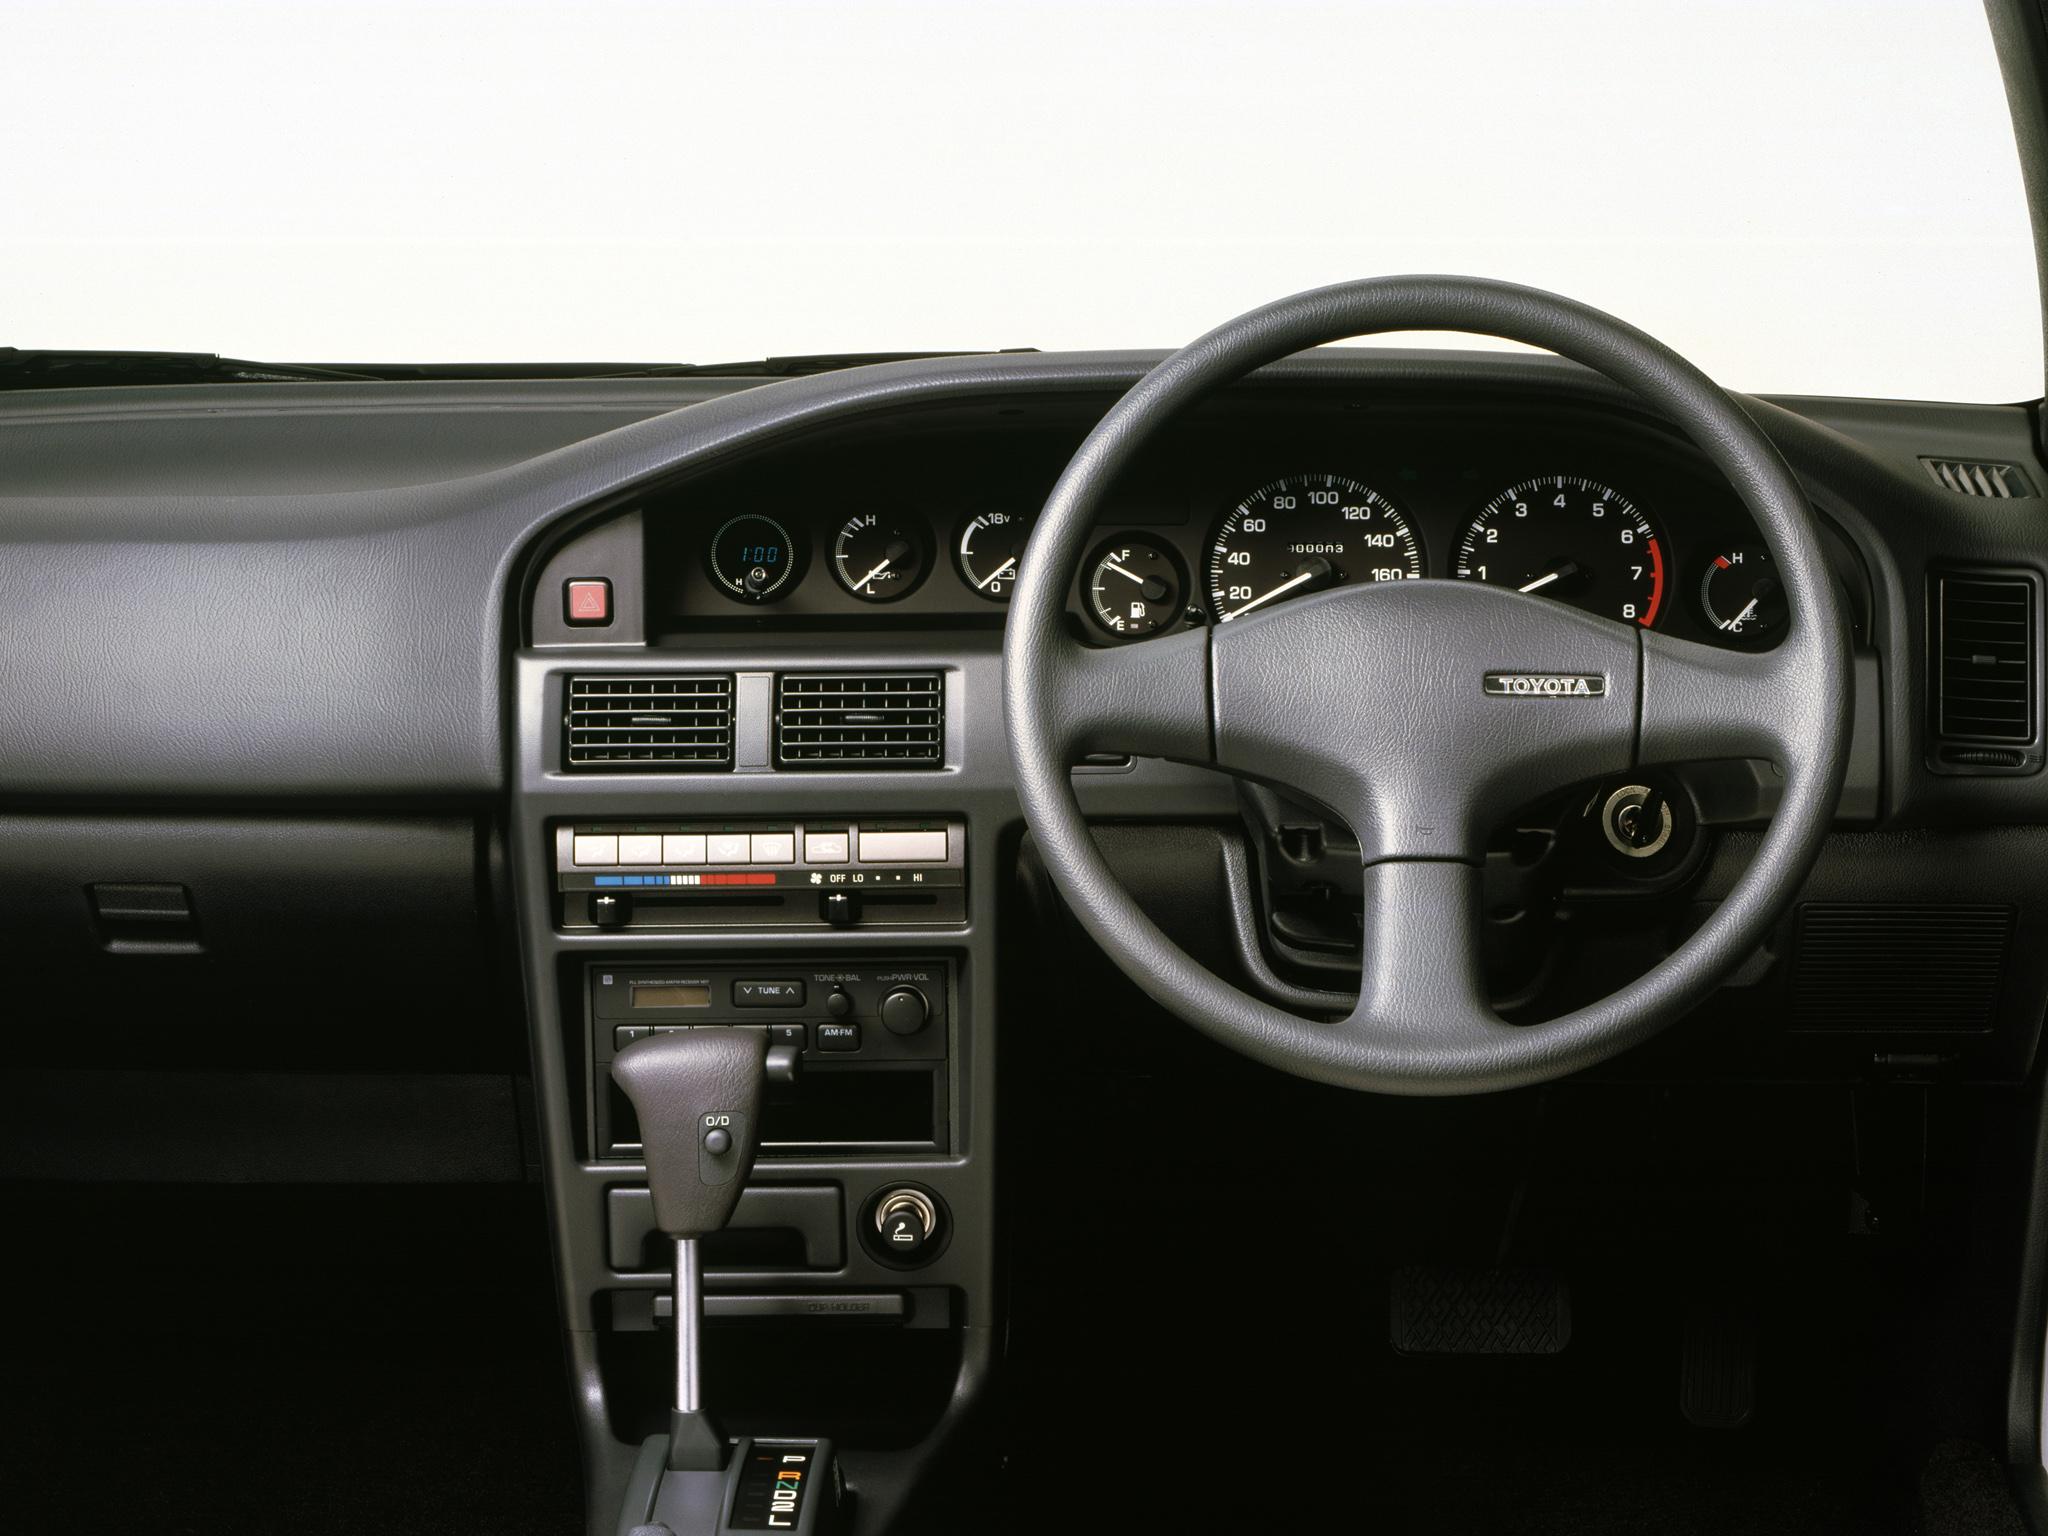 modified toyota tazz interior dashboard    toyota    corolla  e90      kvalitetna i pouzdana     toyota    corolla  e90      kvalitetna i pouzdana